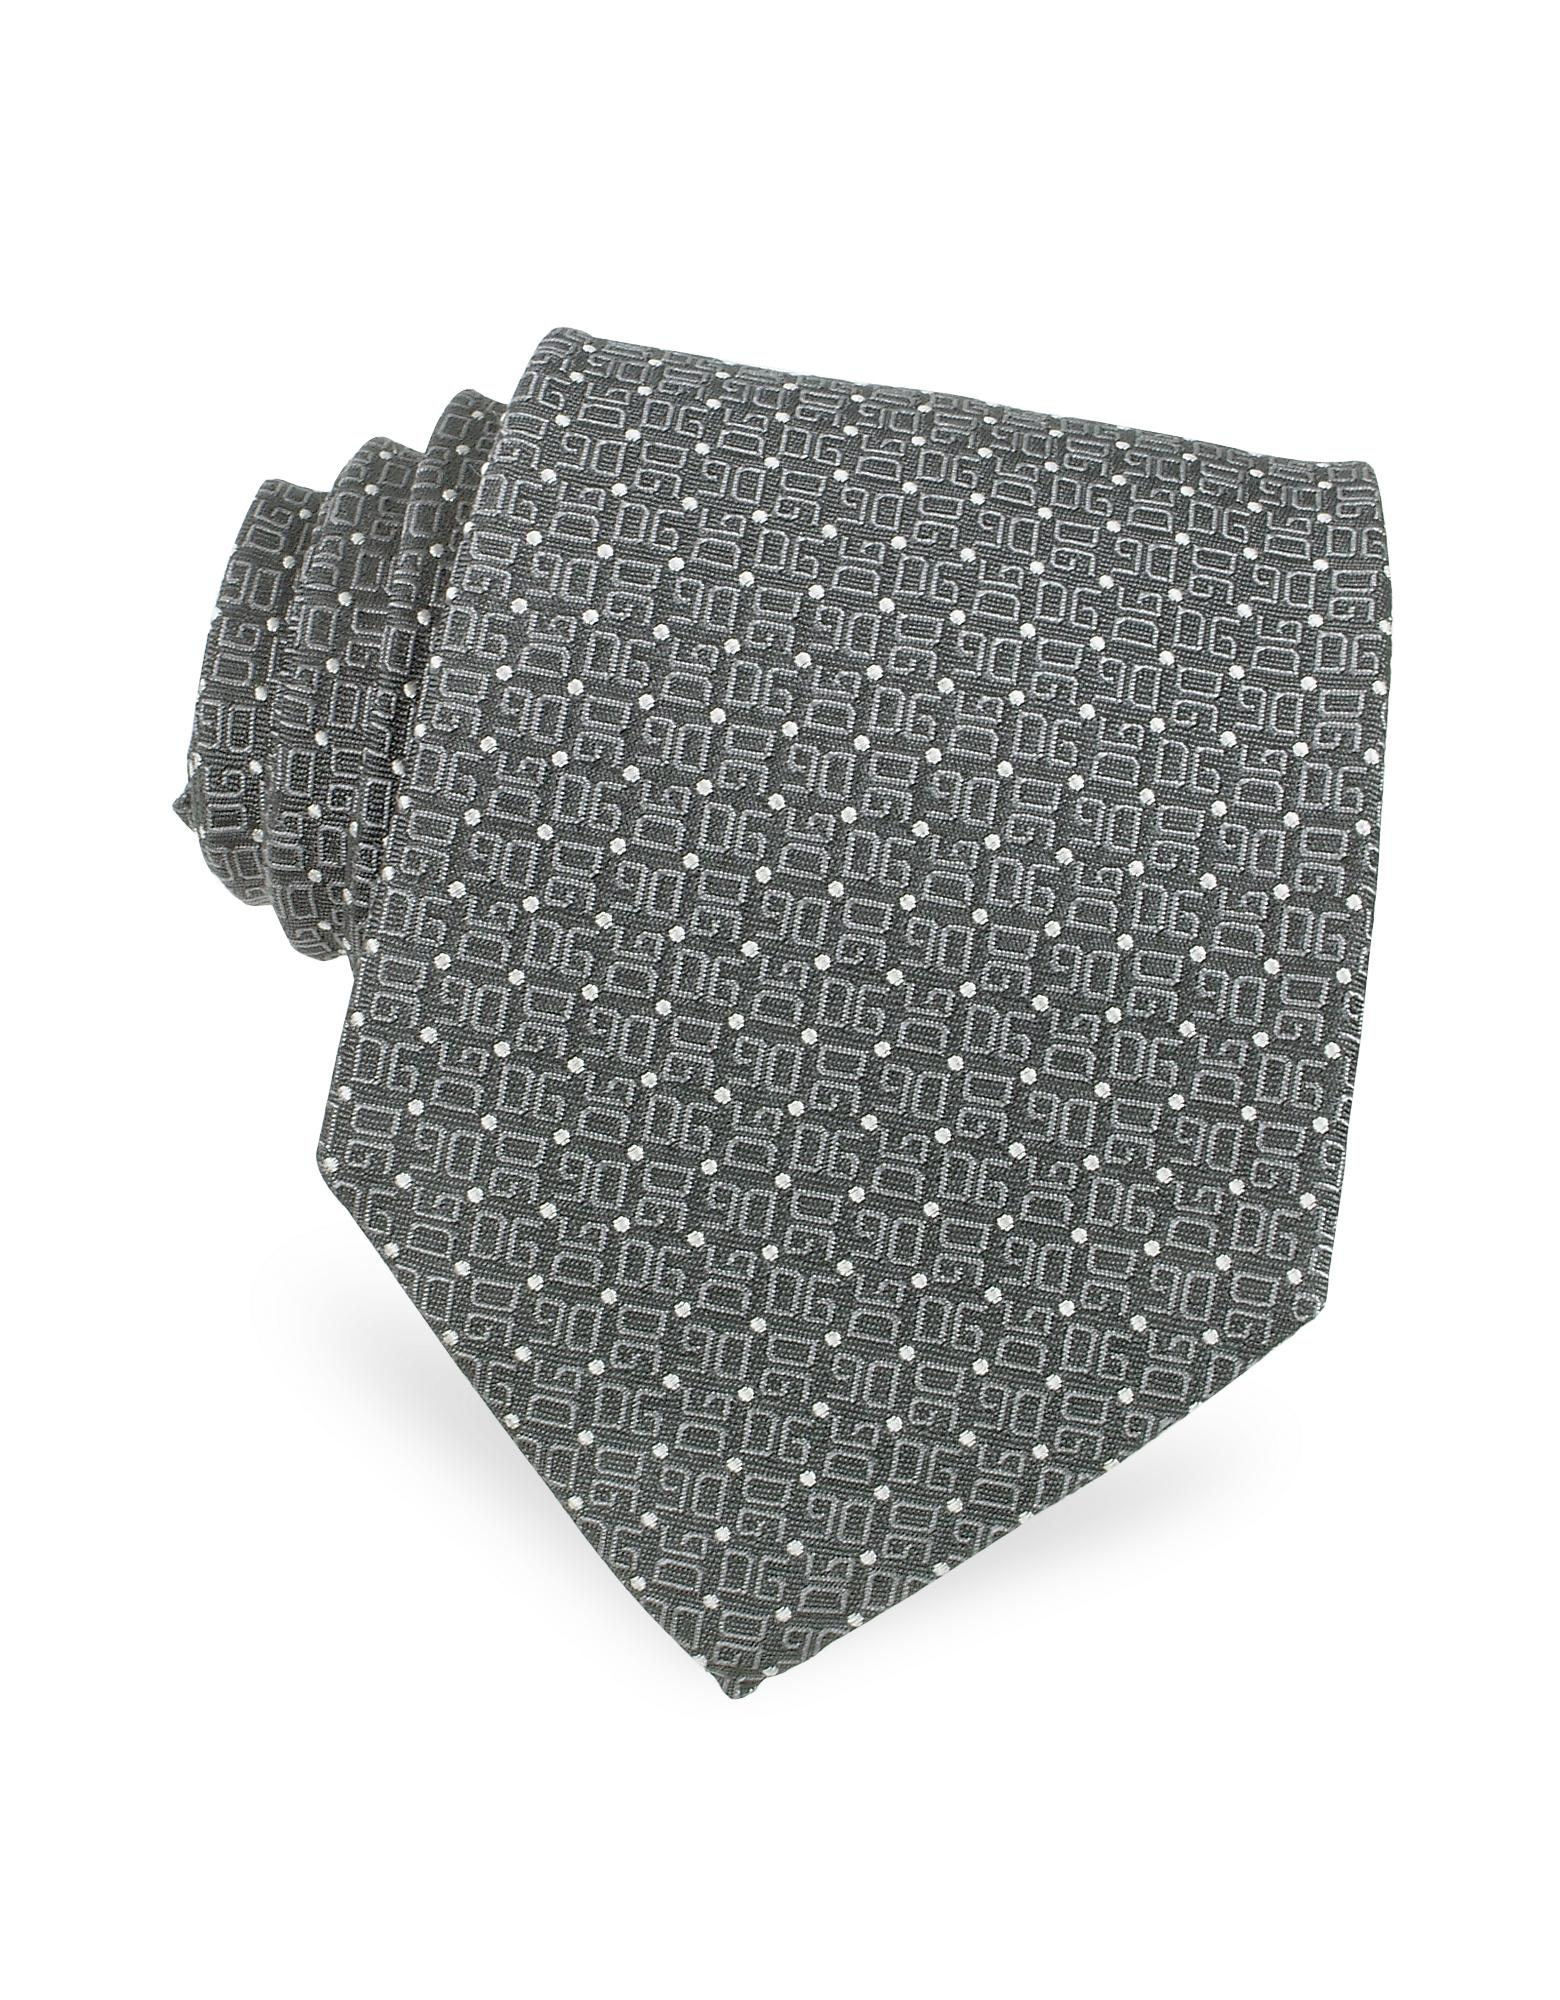 Dolce & Gabbana  All Over Mini Logo & Dots Woven Silk Tie